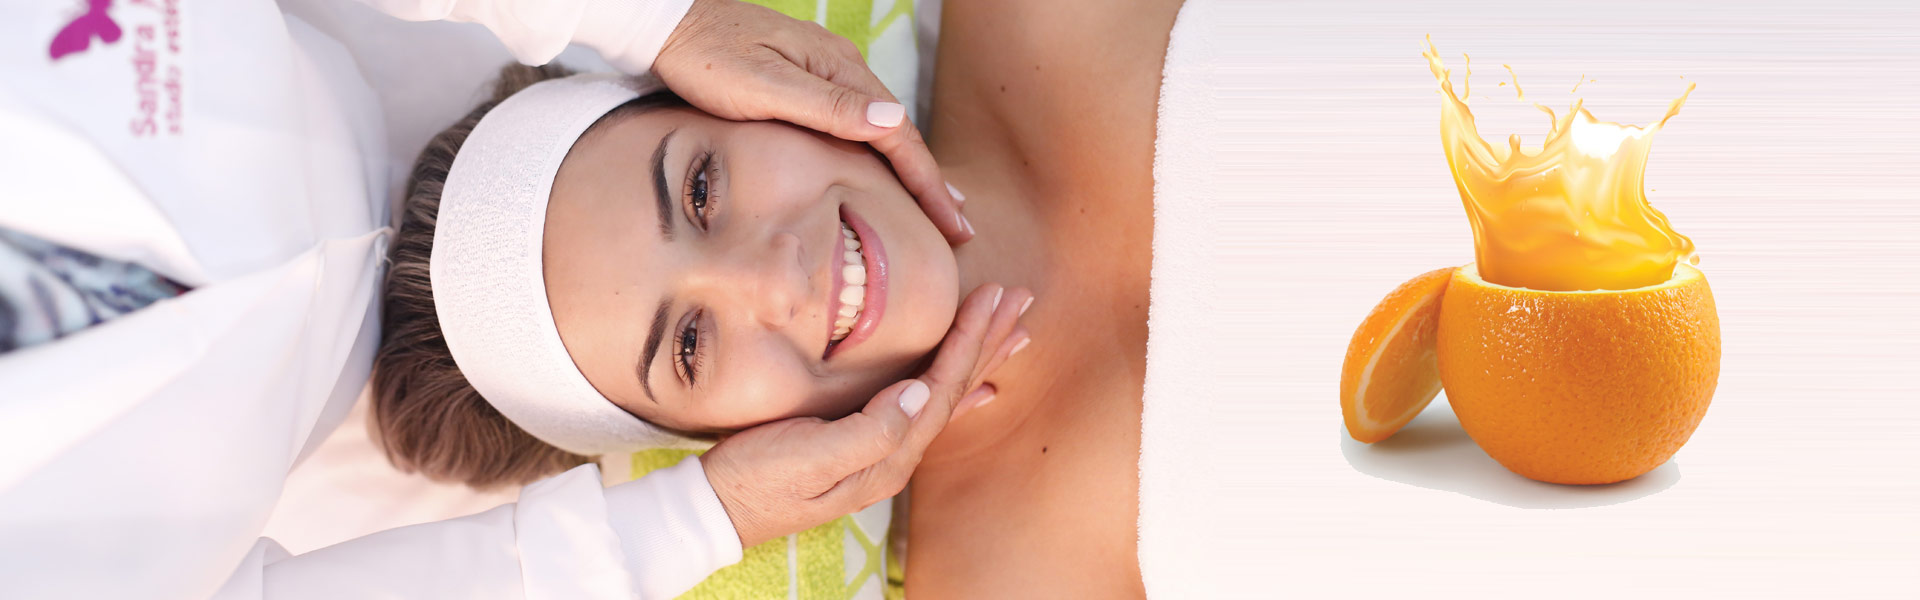 tratamento-vitamina-c-para-pele-brasilia